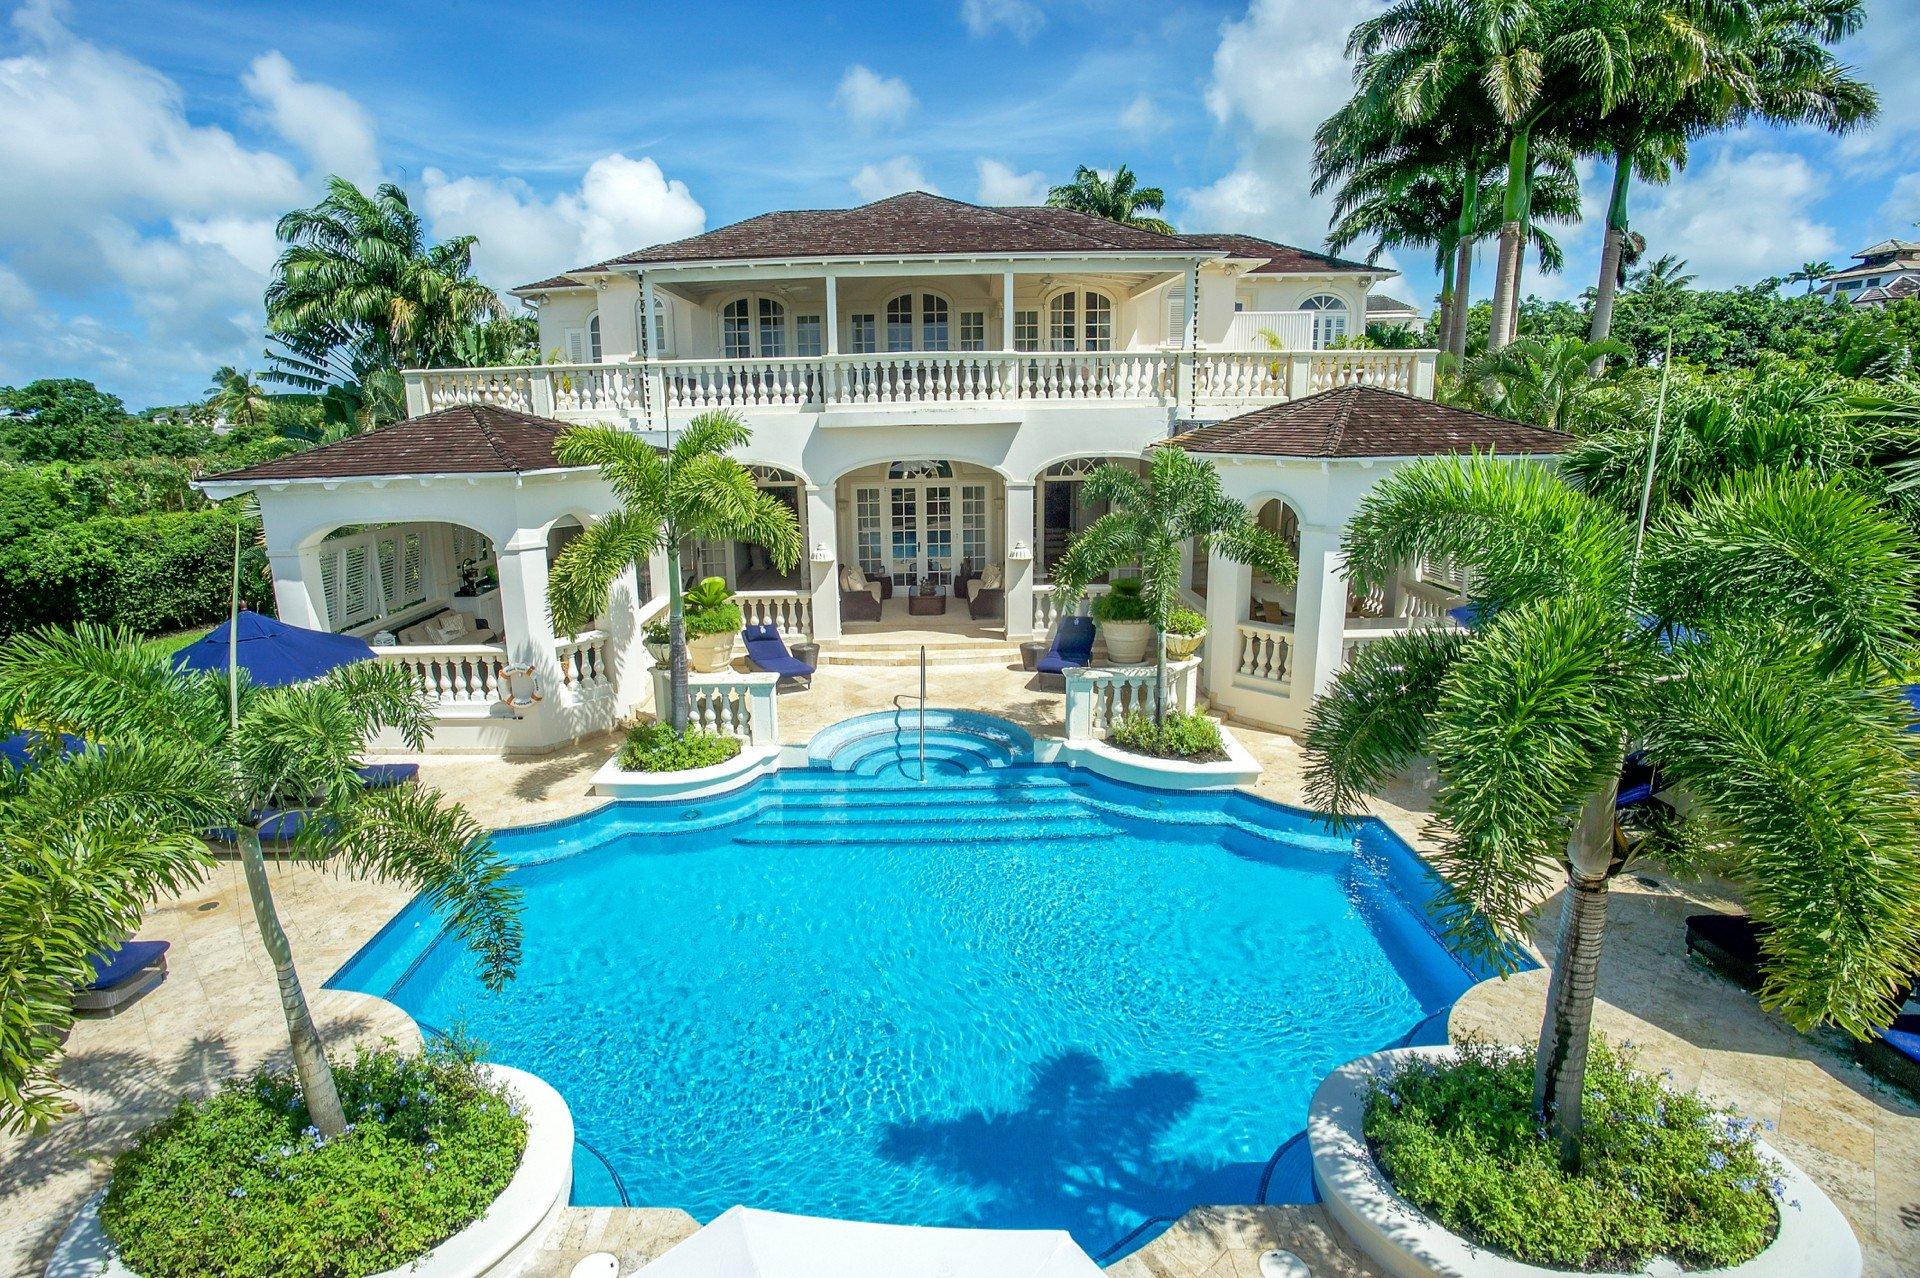 Plantation House Barbados